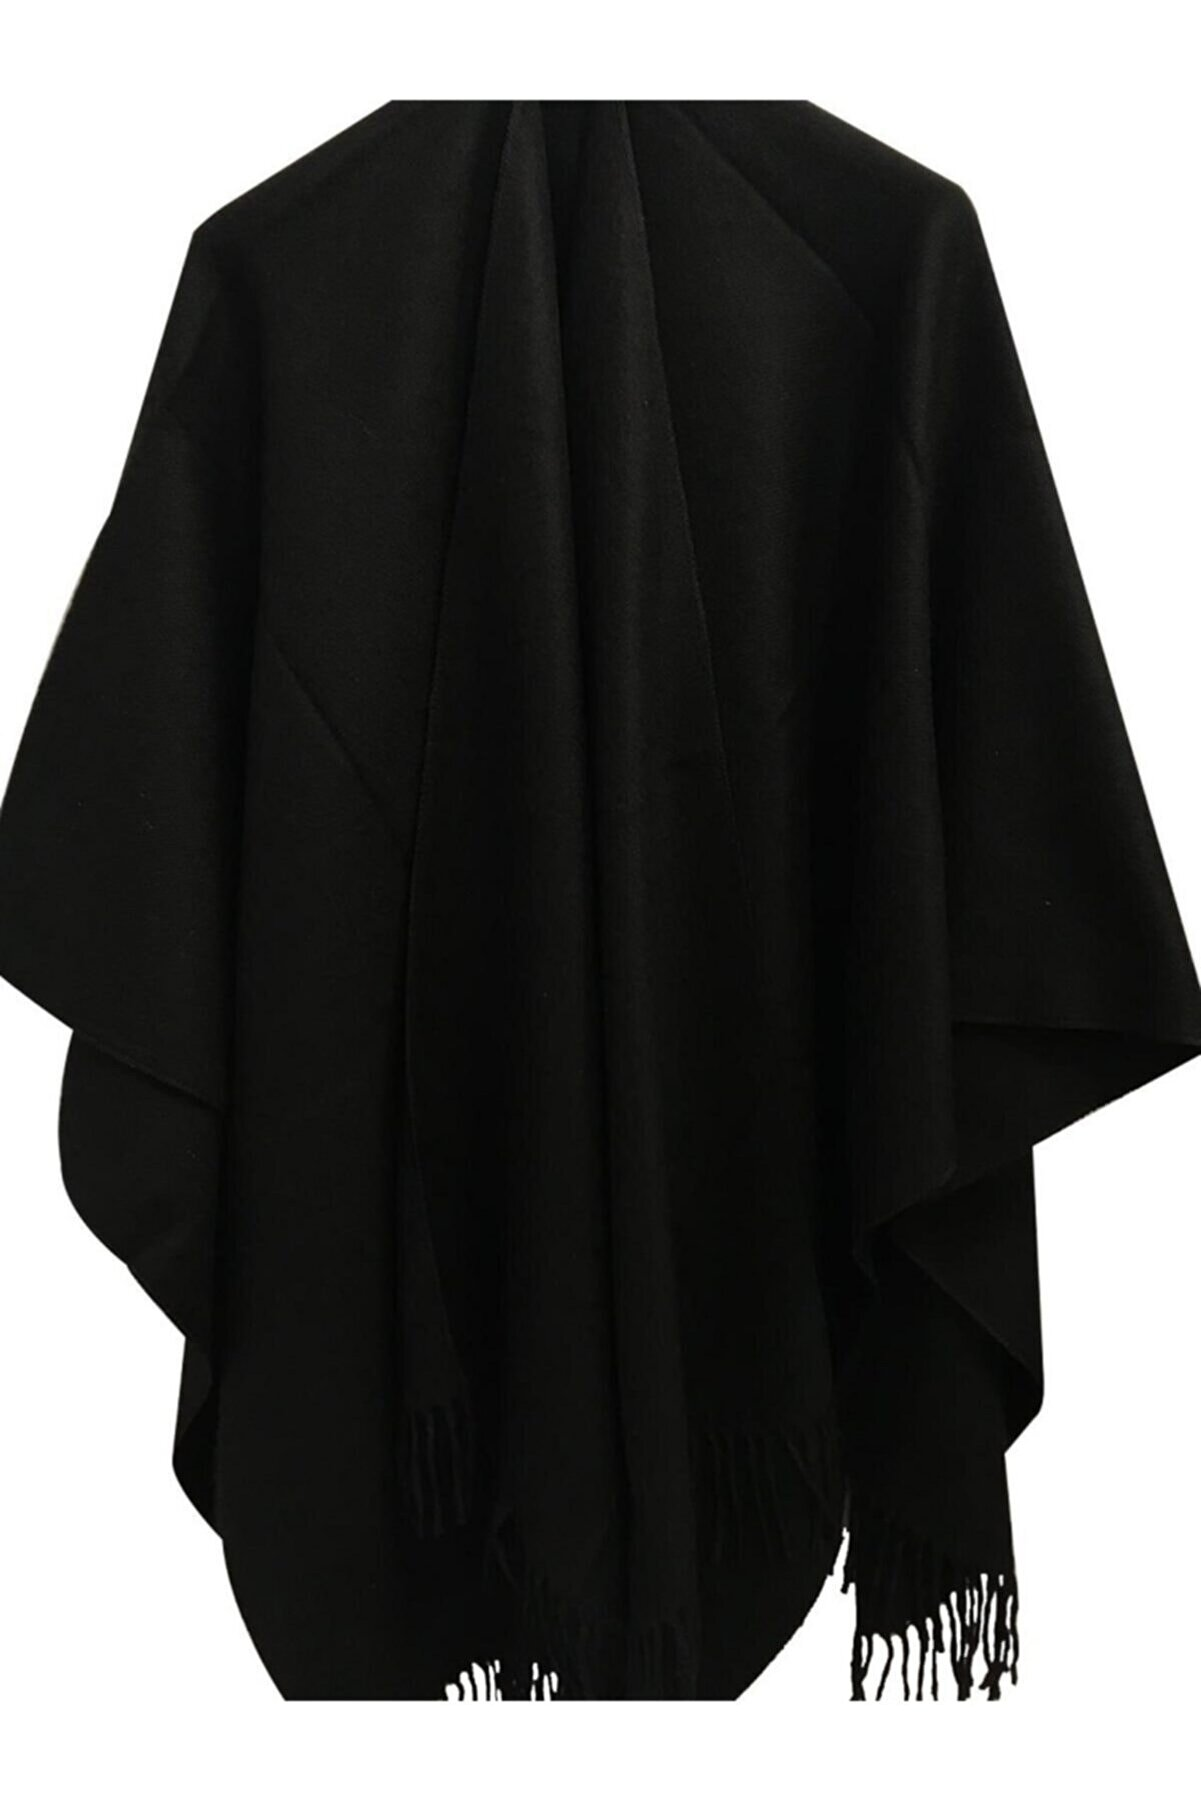 KARADAŞ Kadın Siyah Düz Panço